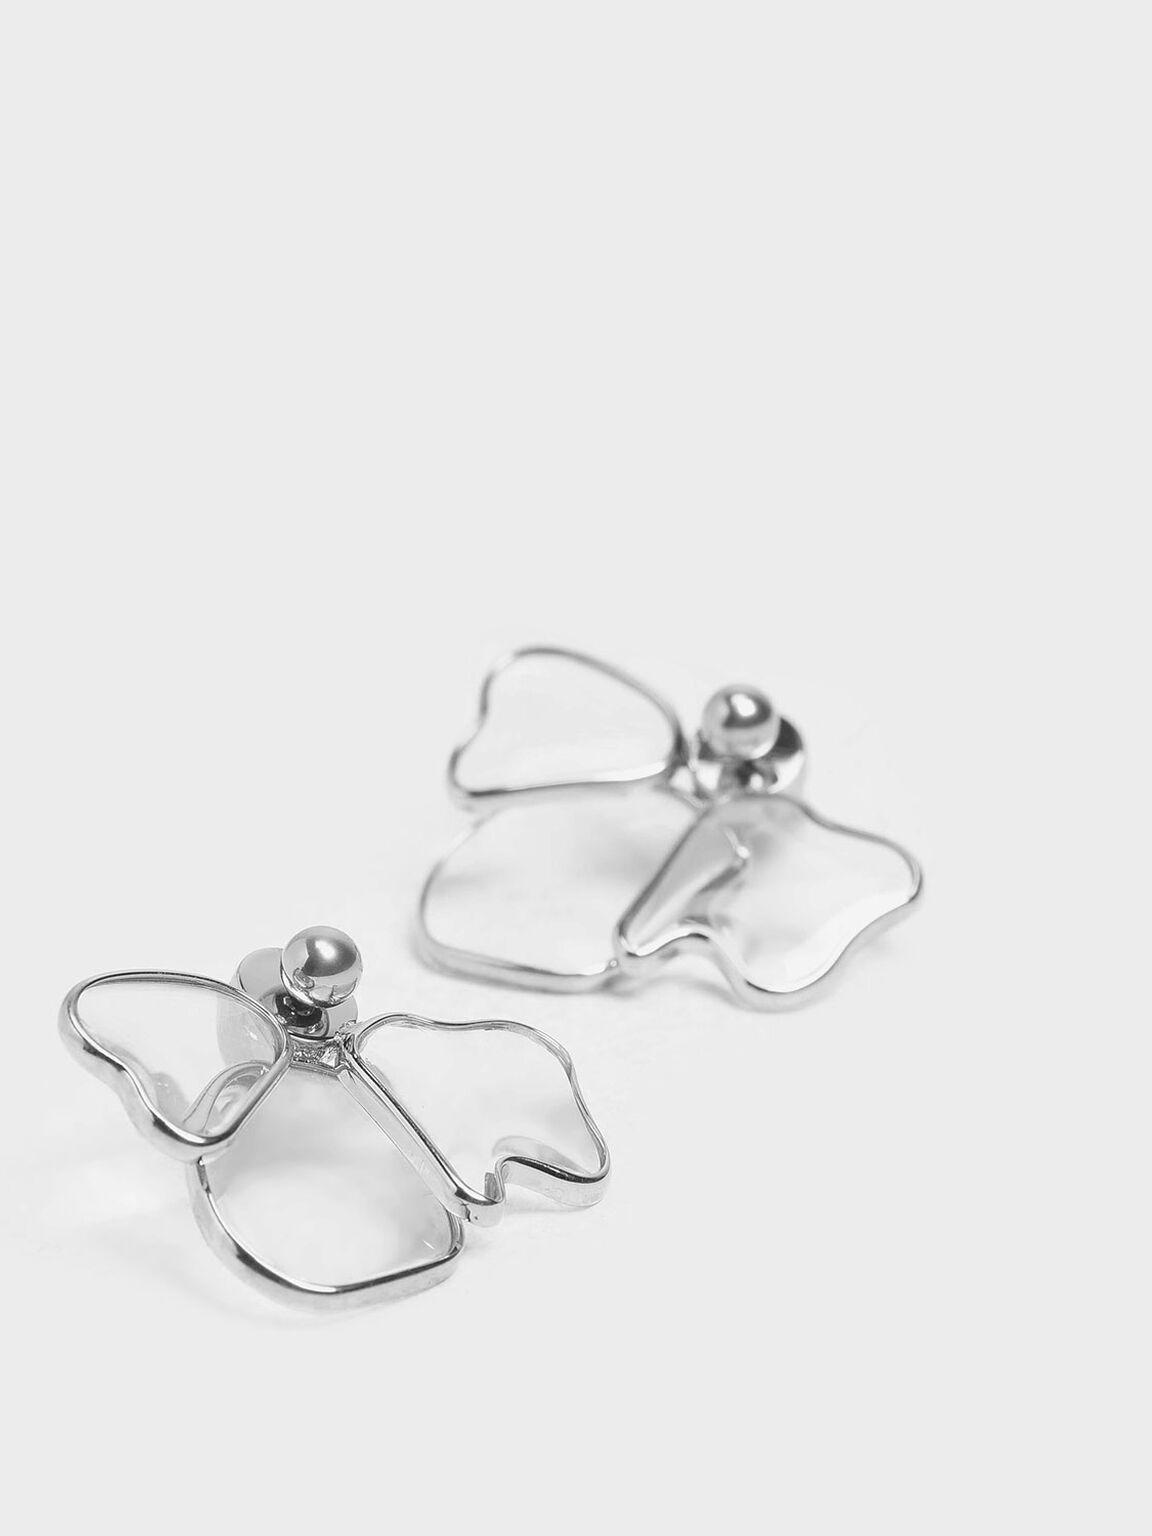 Crystal & Acrylic Petal Stud Earrings, Silver, hi-res